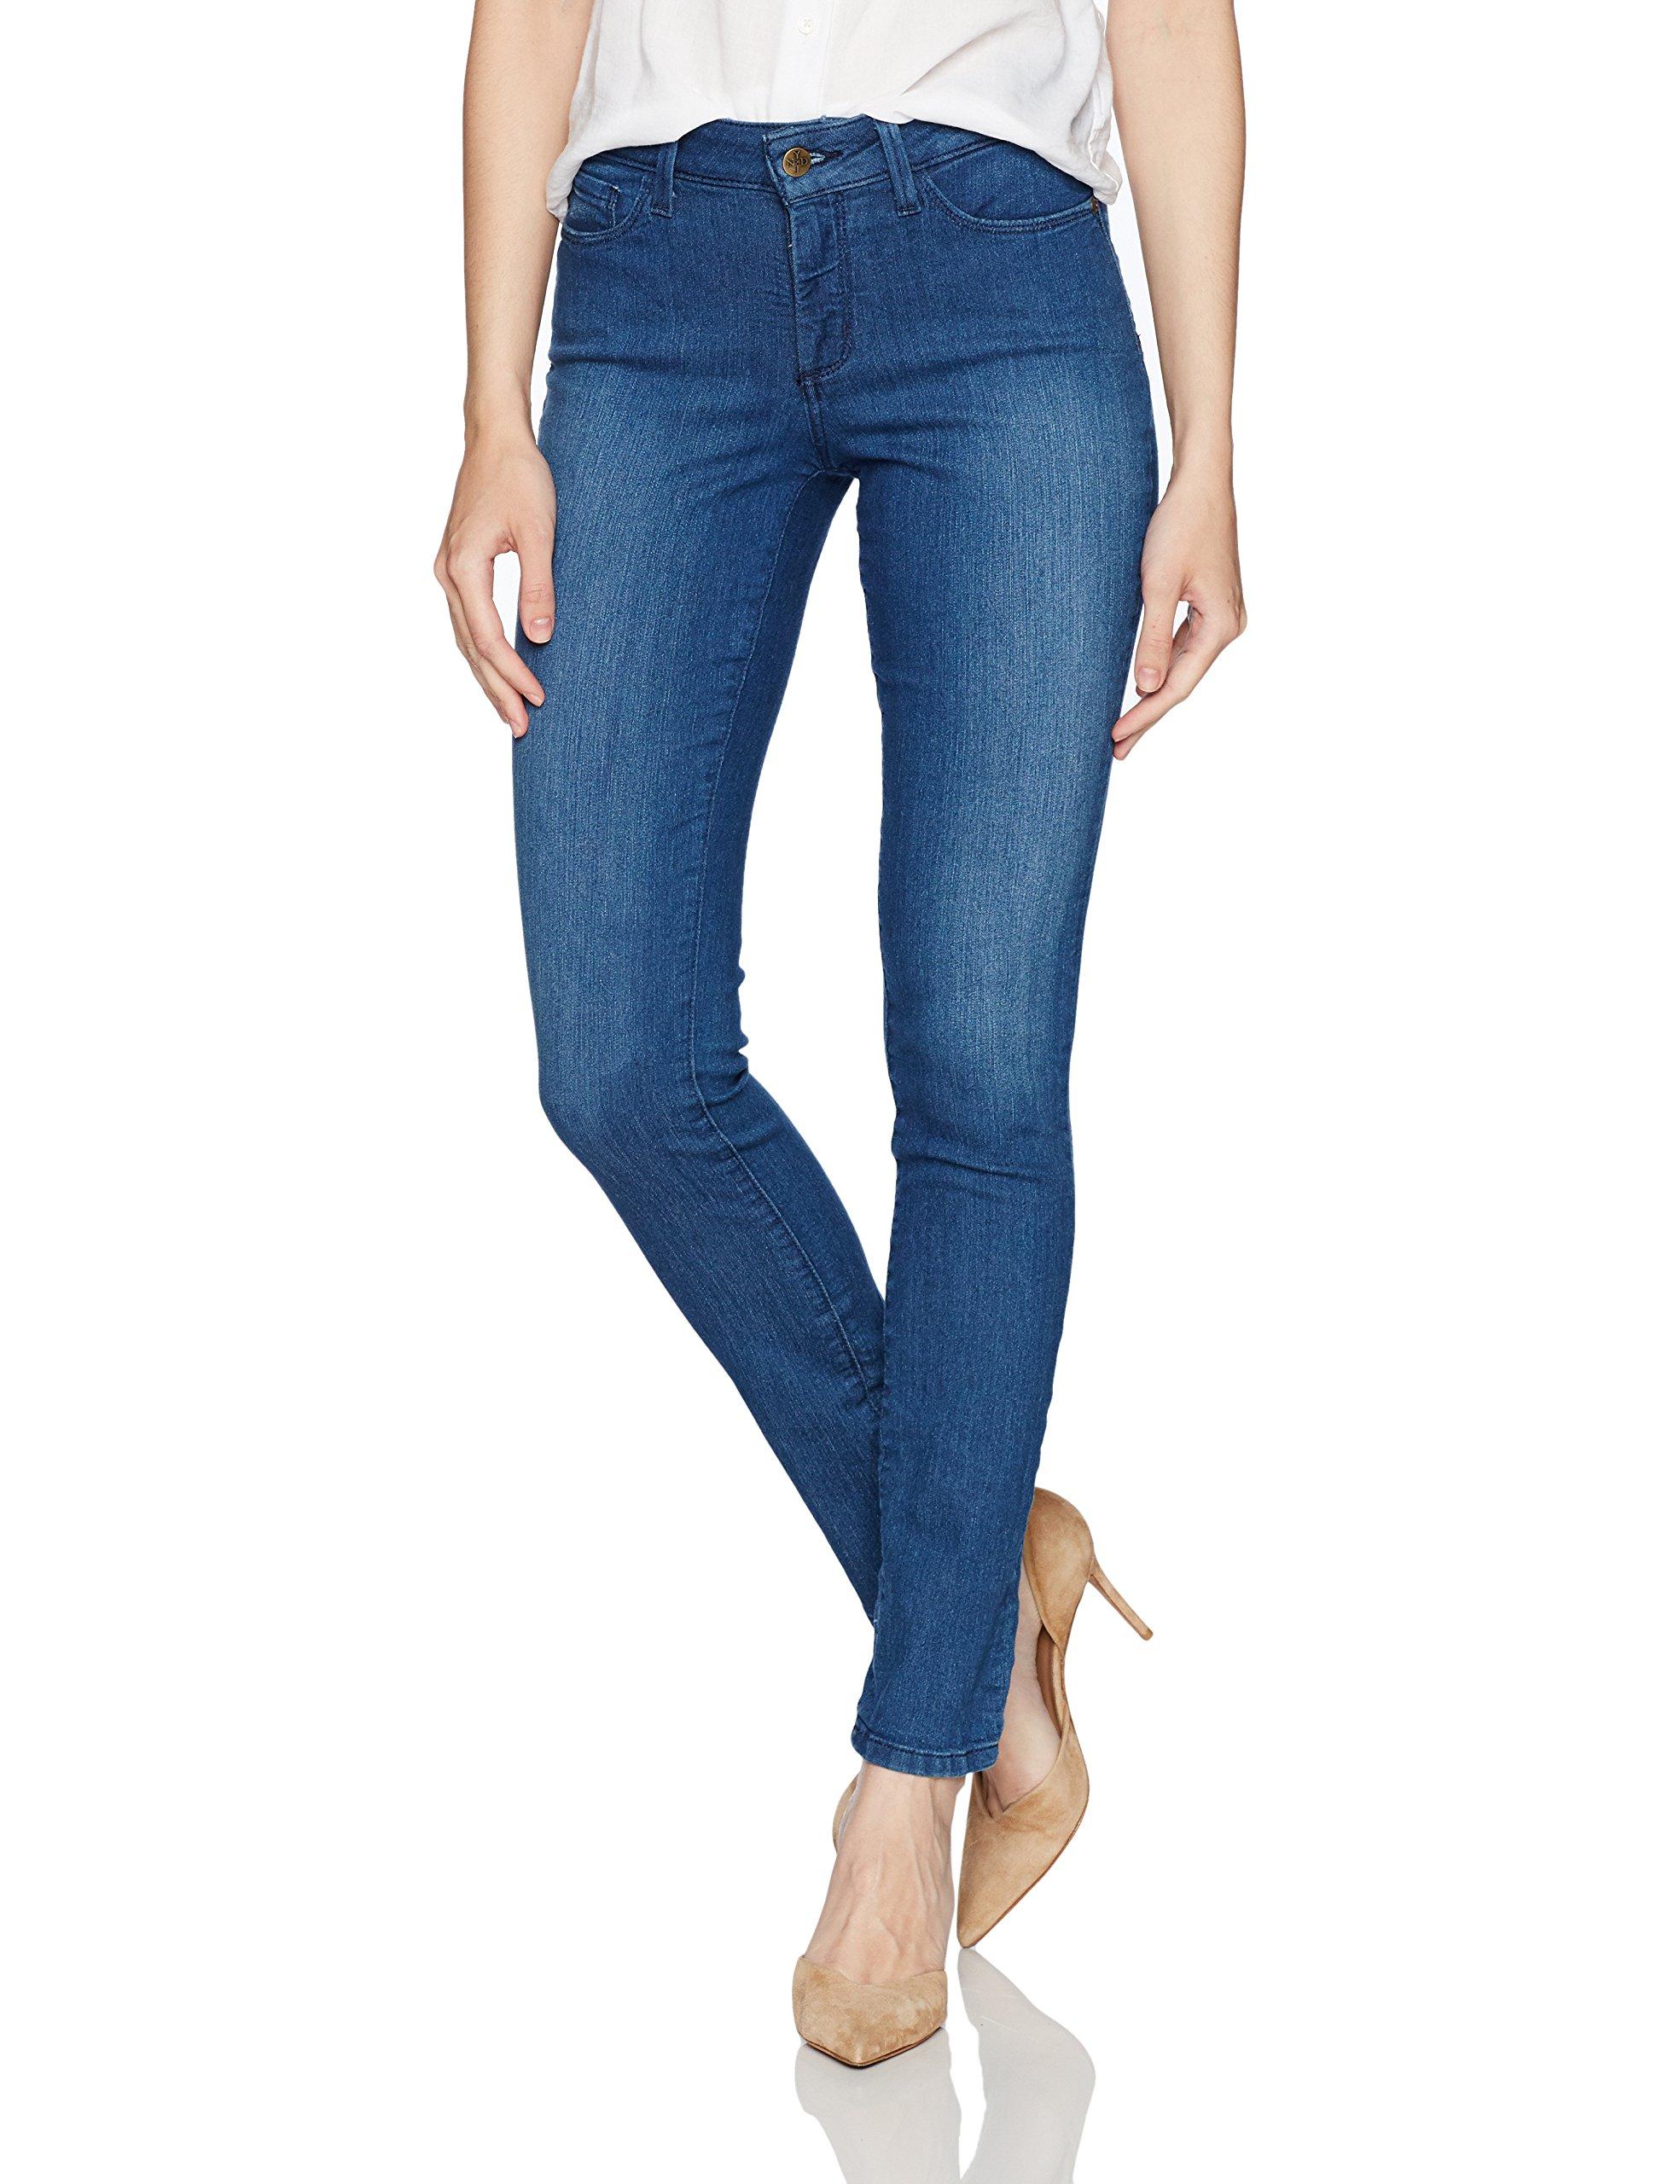 NYDJ Women's Alina Legging Fit Skinny Jeans, Legacy, 18